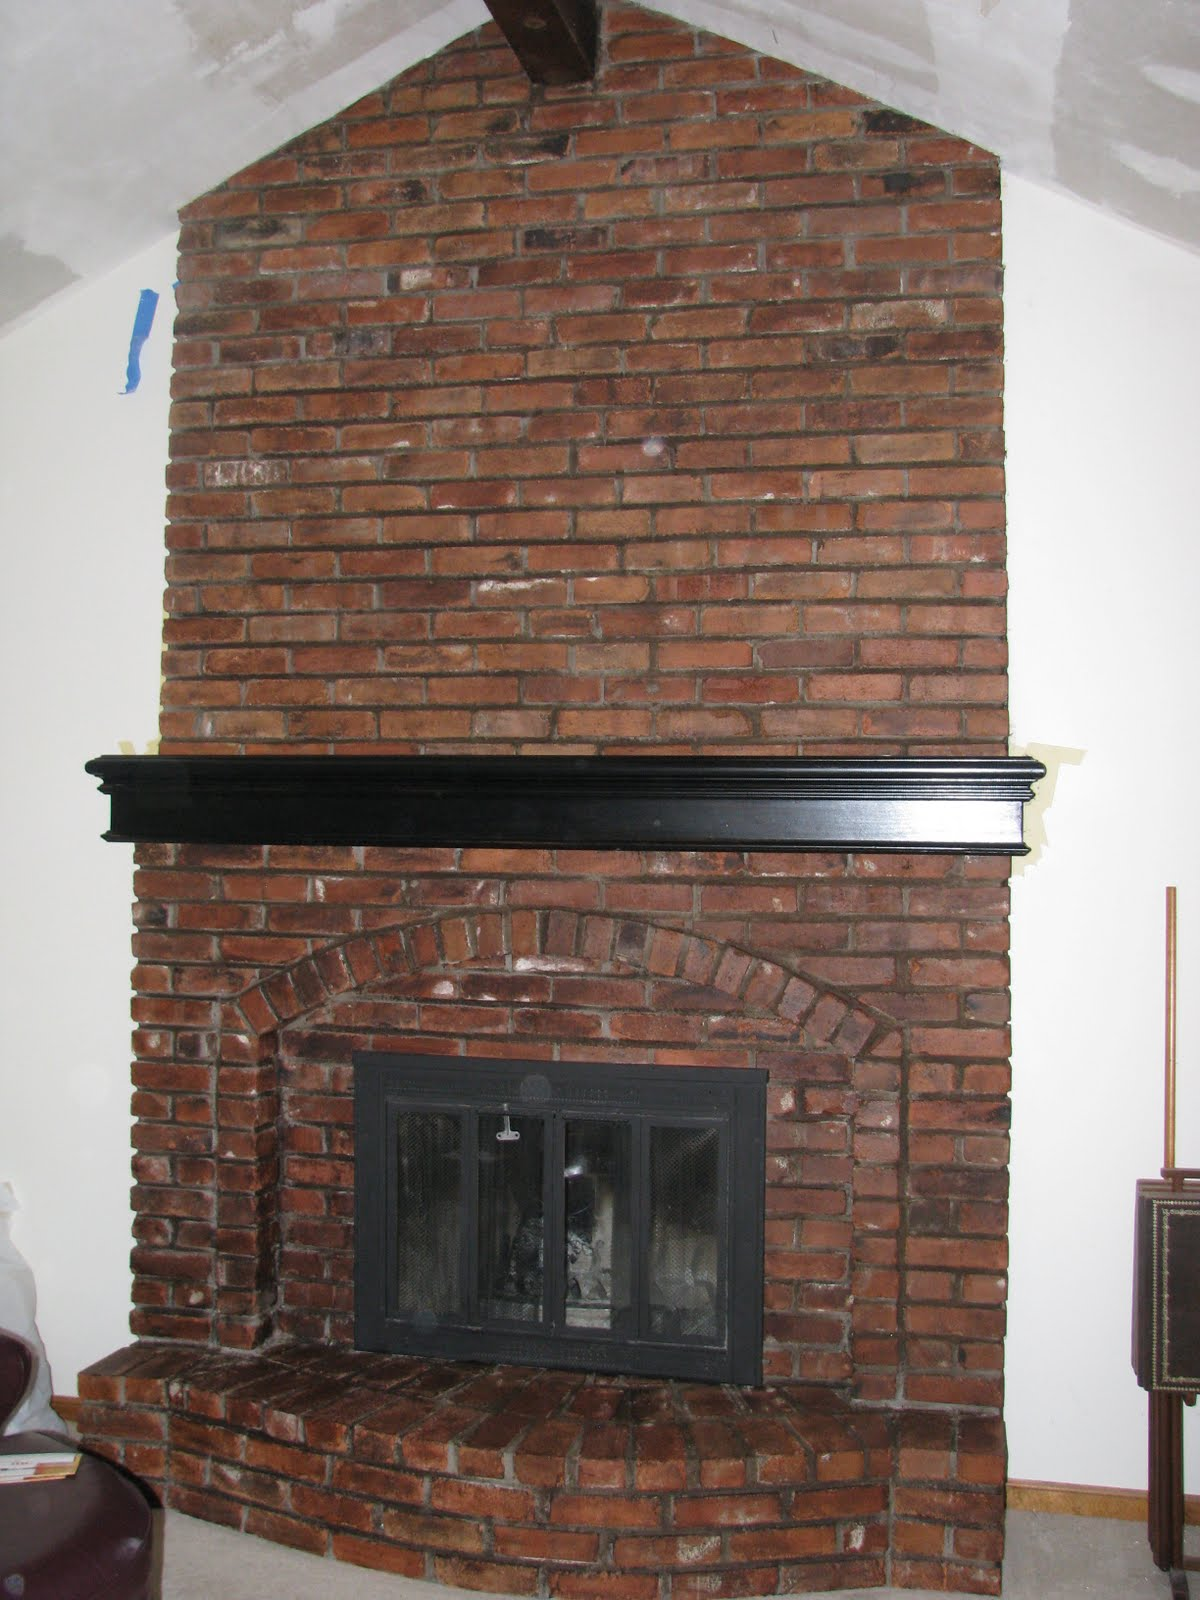 Shabby Chic Brick Fireplace Interior Decorating Las Vegas